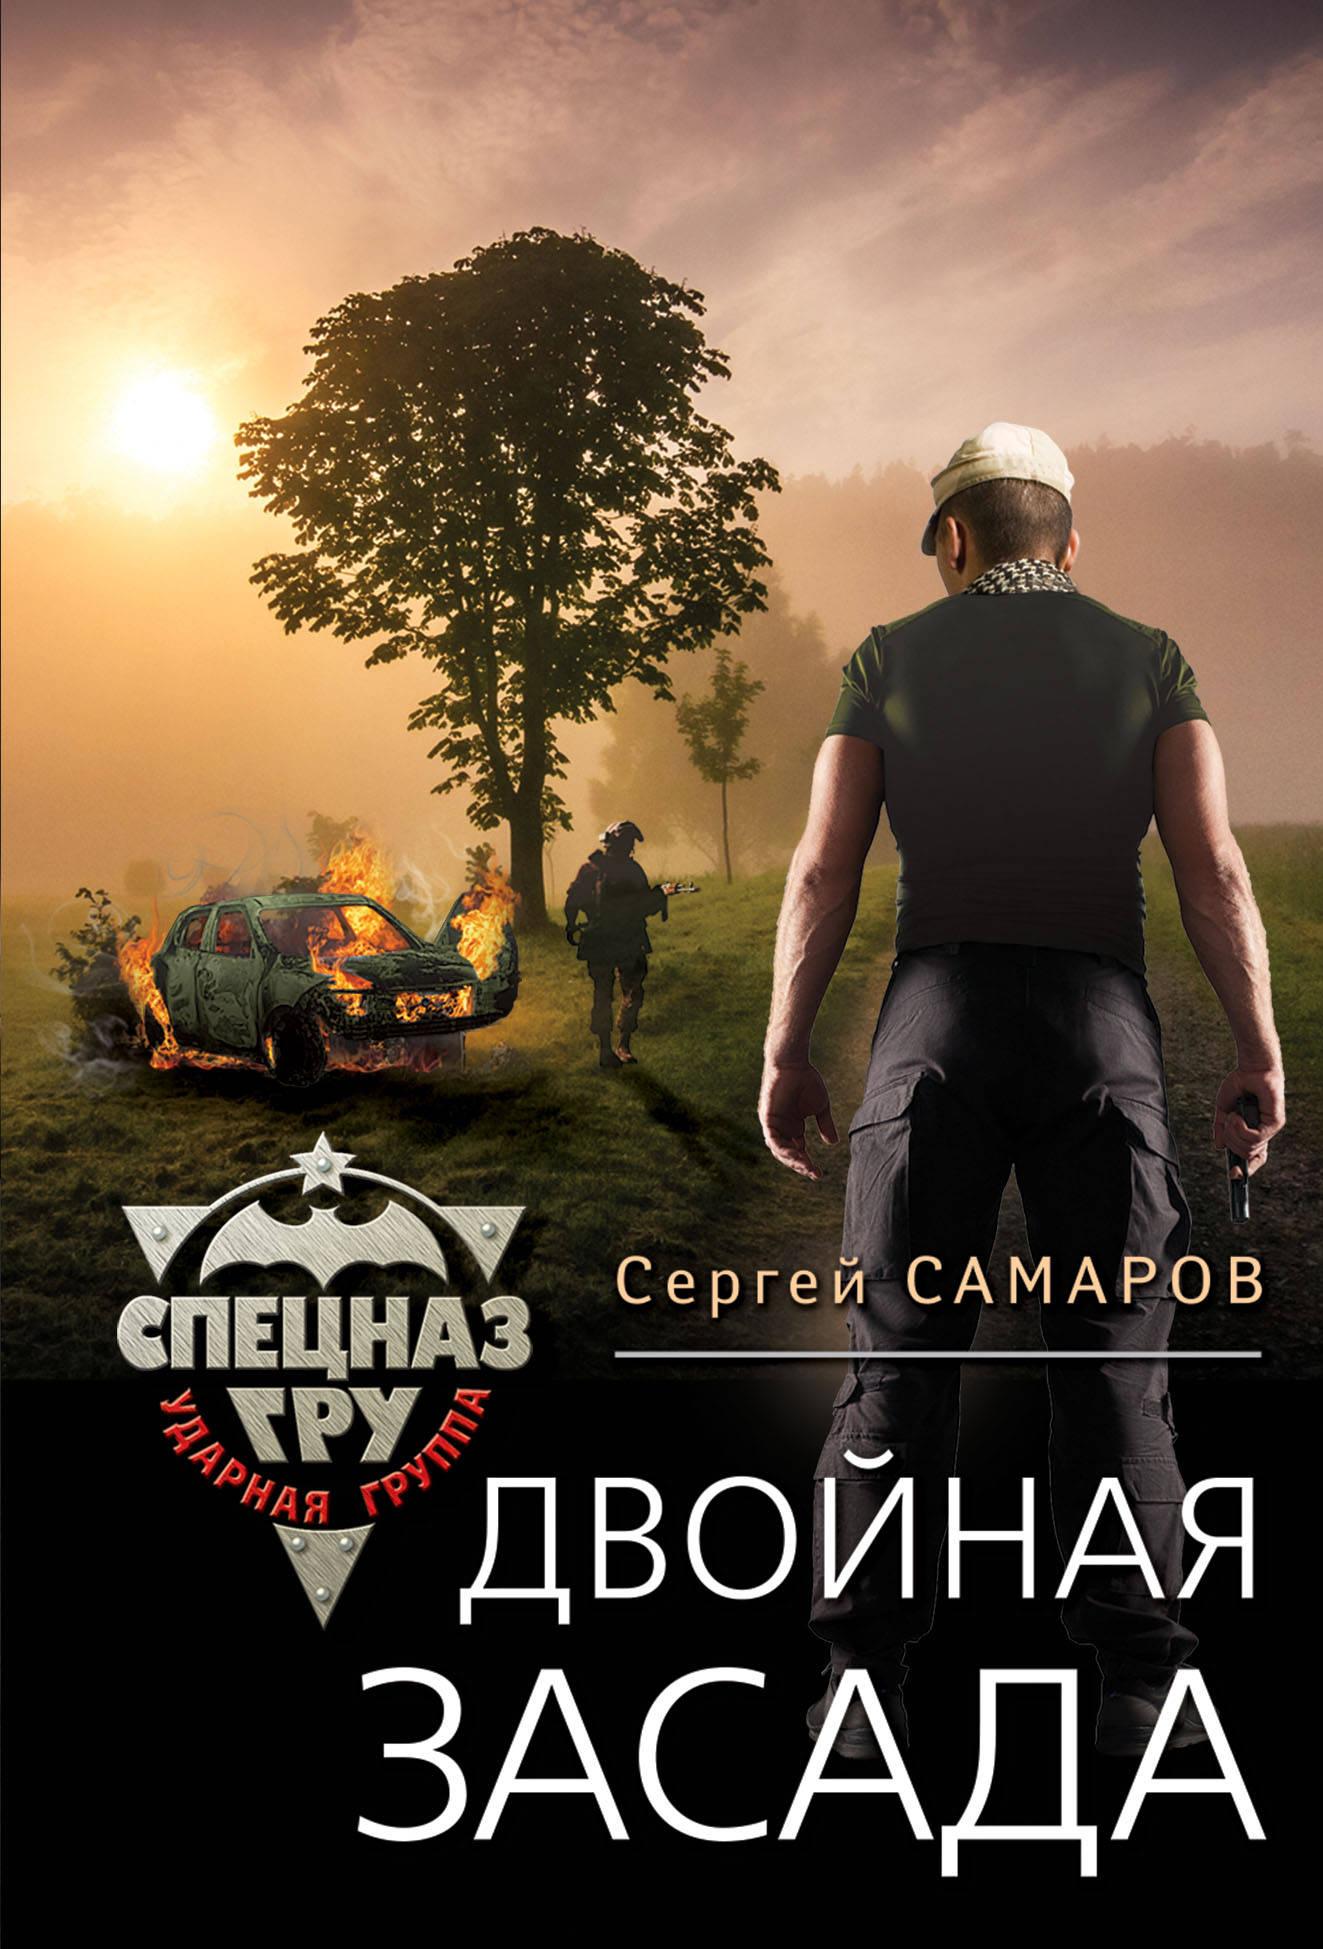 Сергей Самаров Двойная засада сергей самаров русский адат